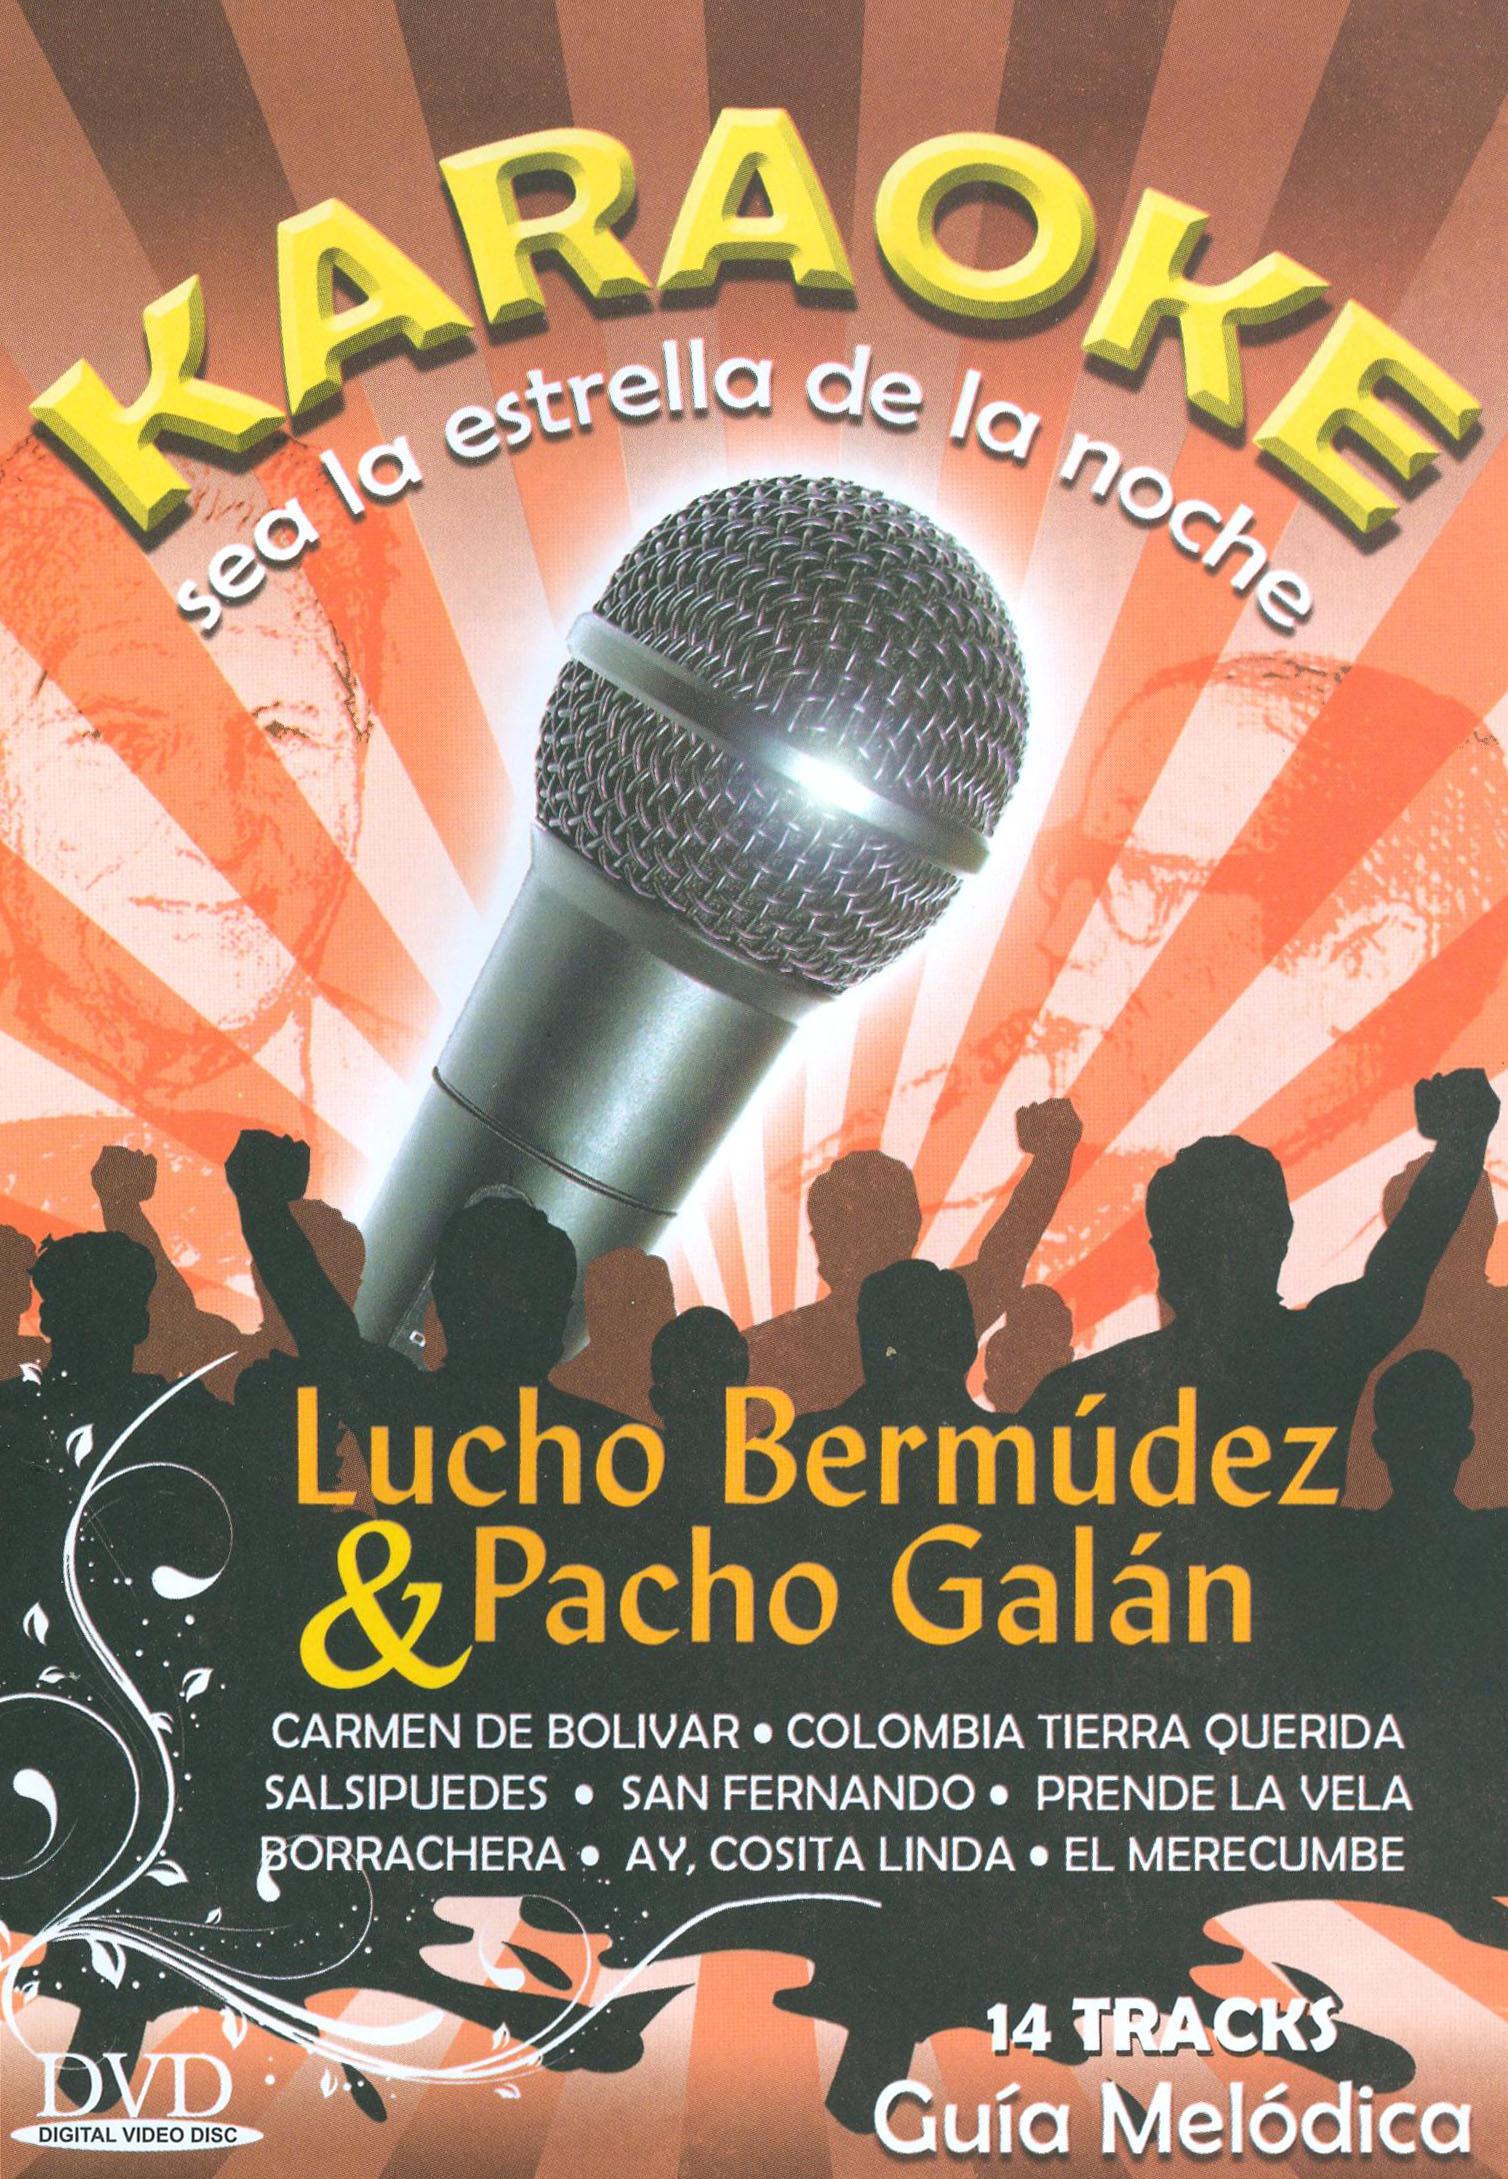 Karaoke: Lucho Bermúdez & Pacho Galán (2009)